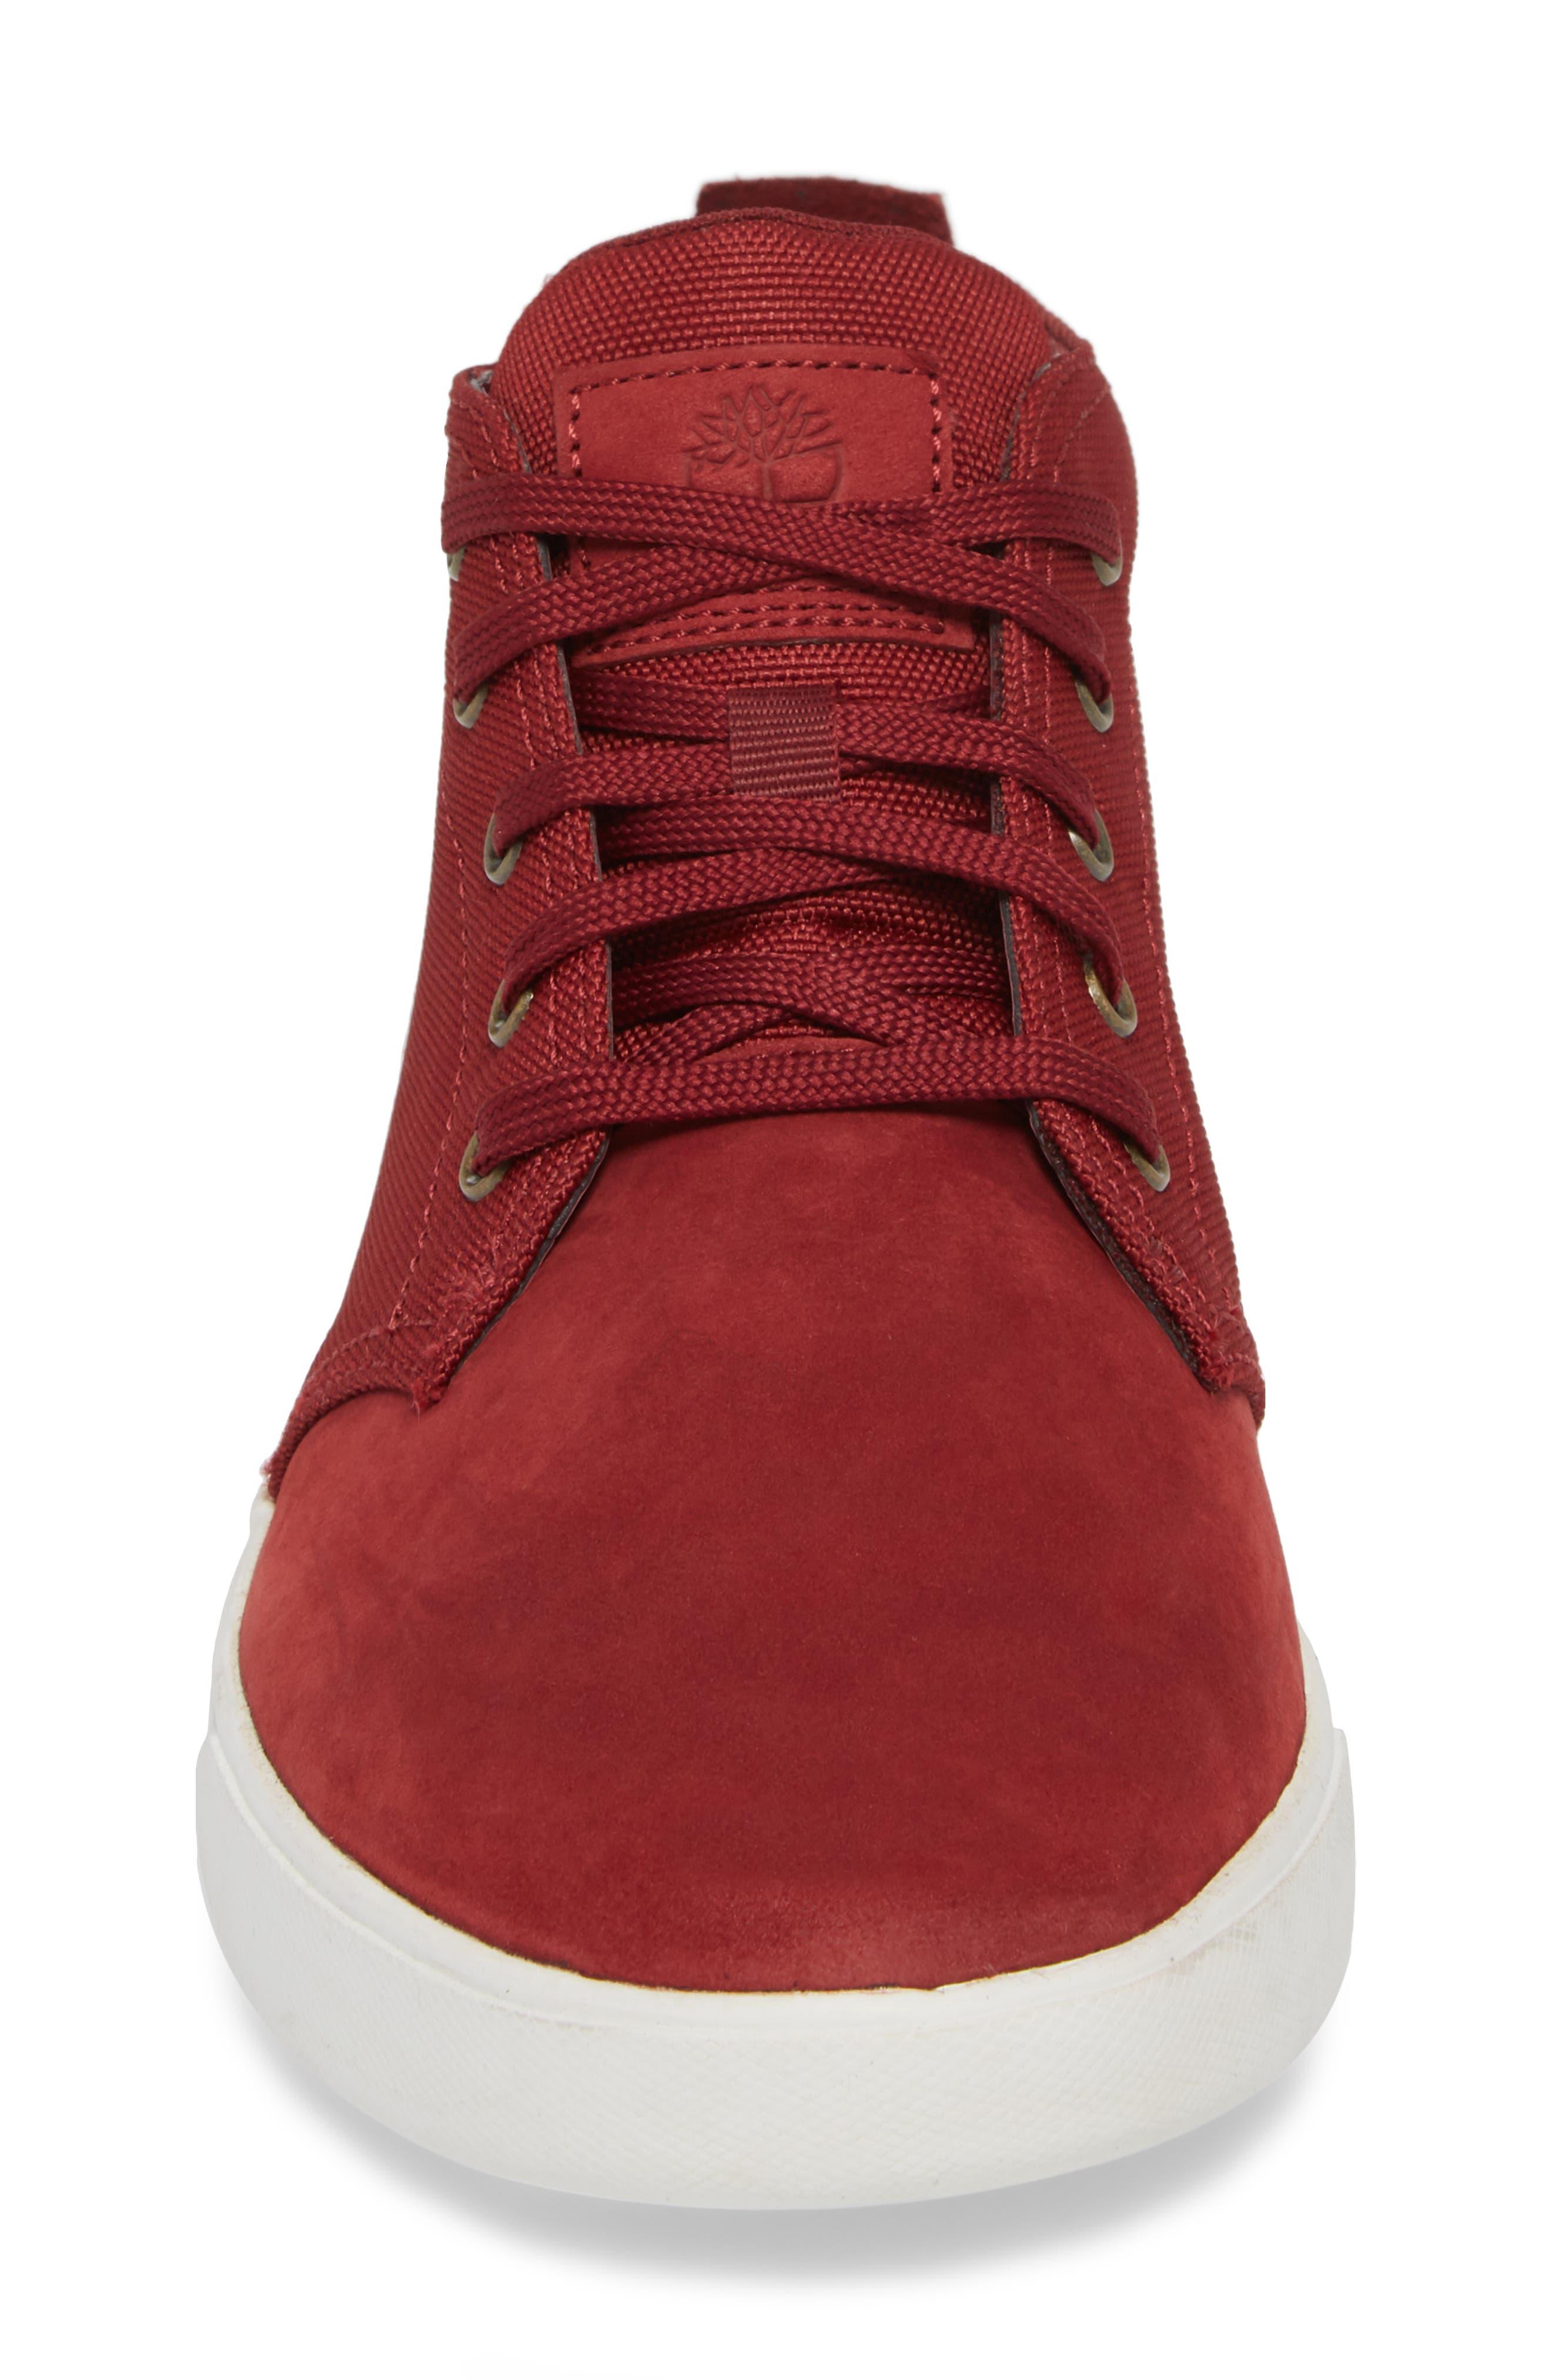 Earthkeepers<sup>™</sup> 'Groveton' Chukka Sneaker,                             Alternate thumbnail 4, color,                             POMEGRANATE NUBUCK